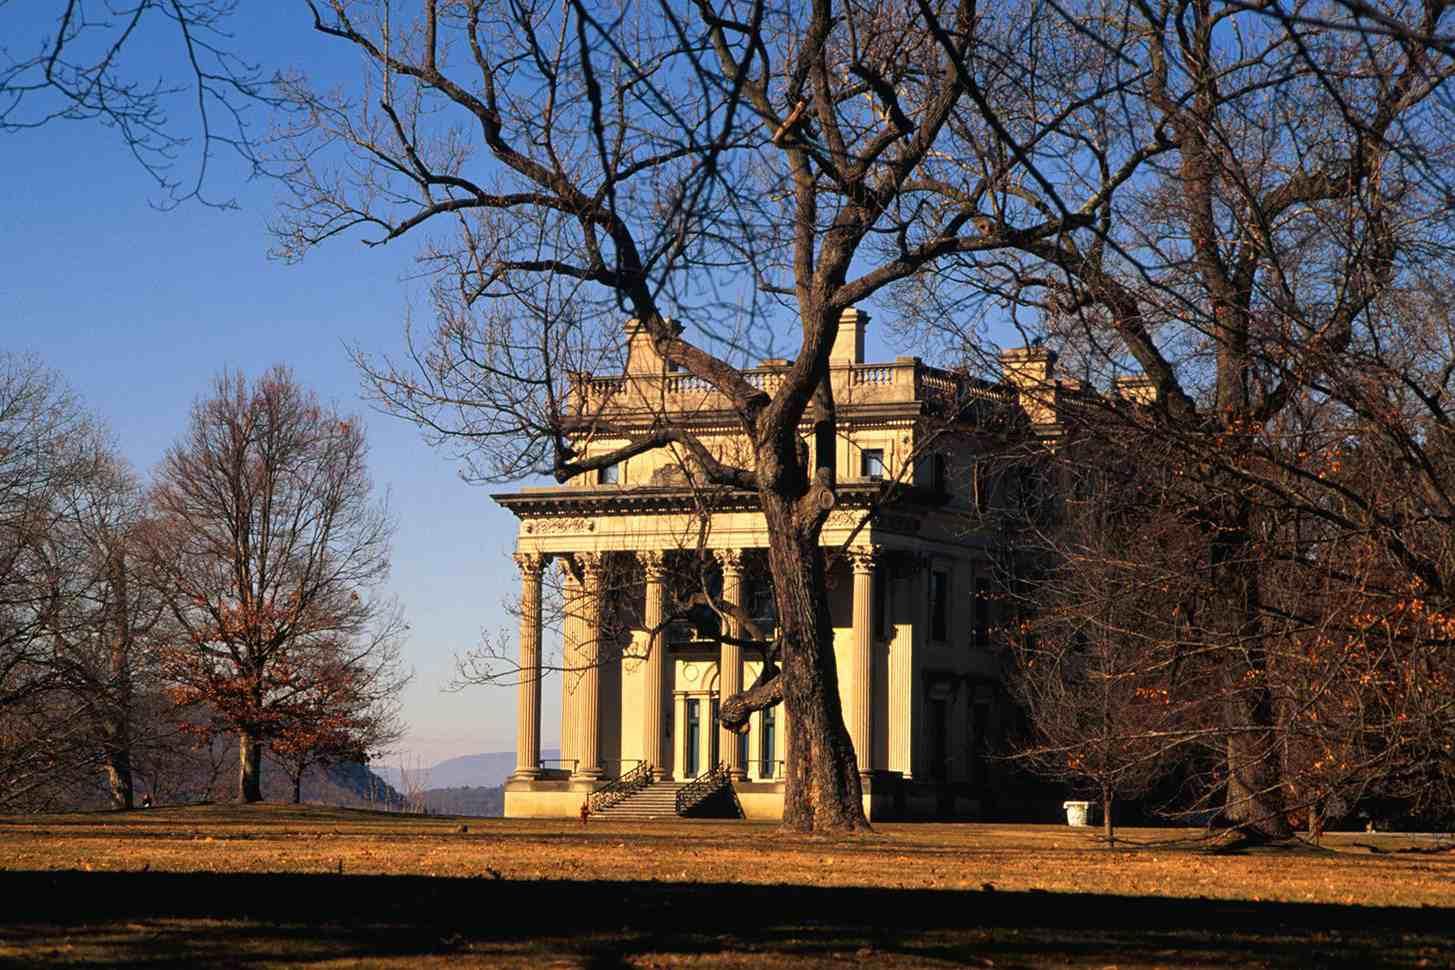 The Vanderbilt Museum